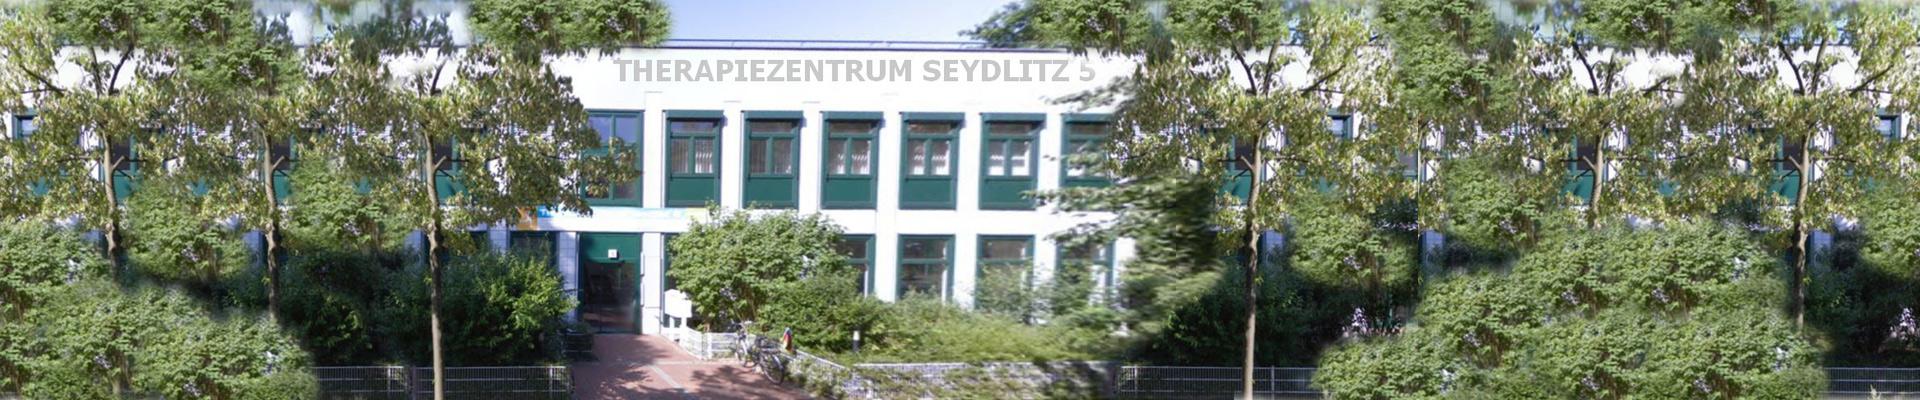 Therapiezentrum